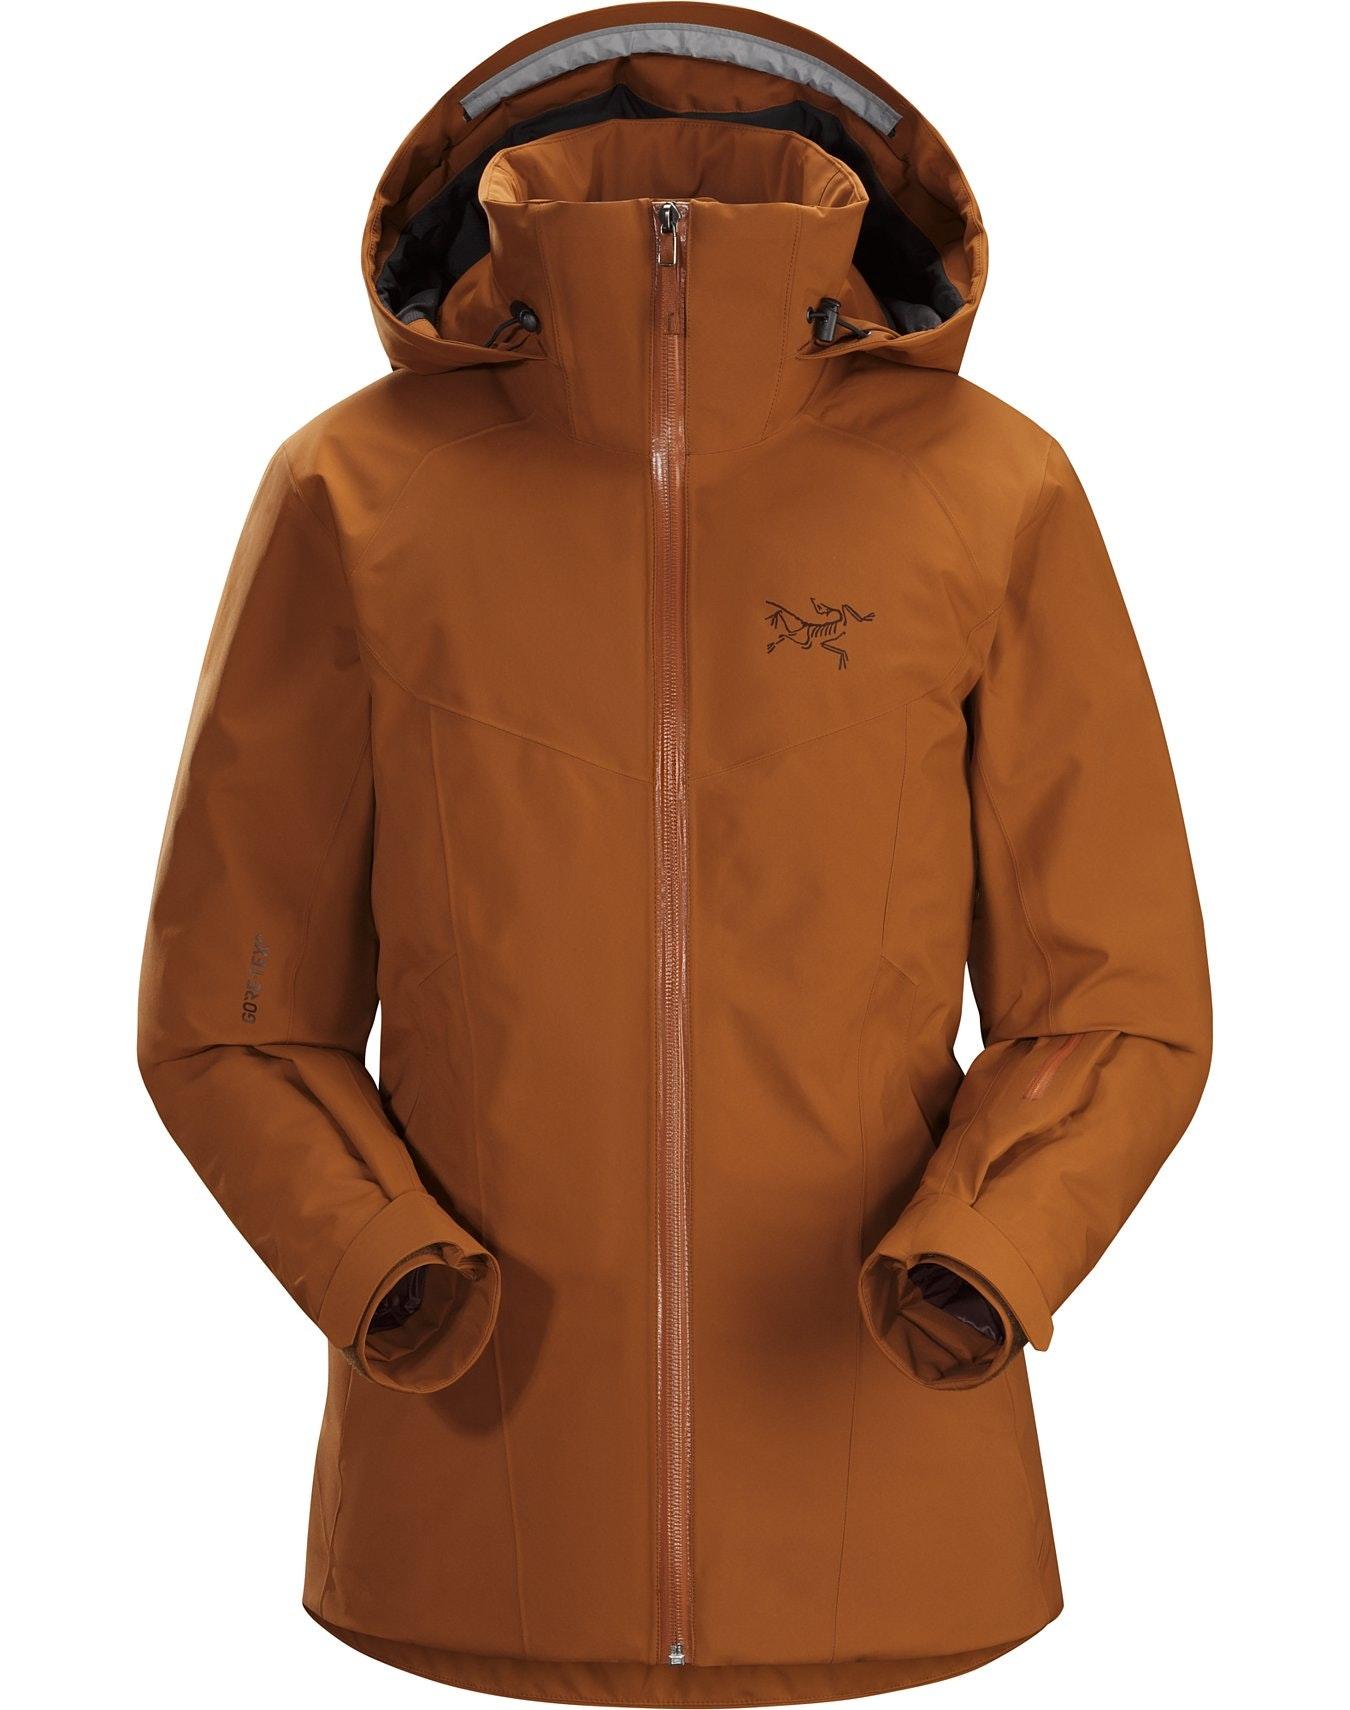 Tiya Jacket   Womens   Arc teryx 86894bc6d